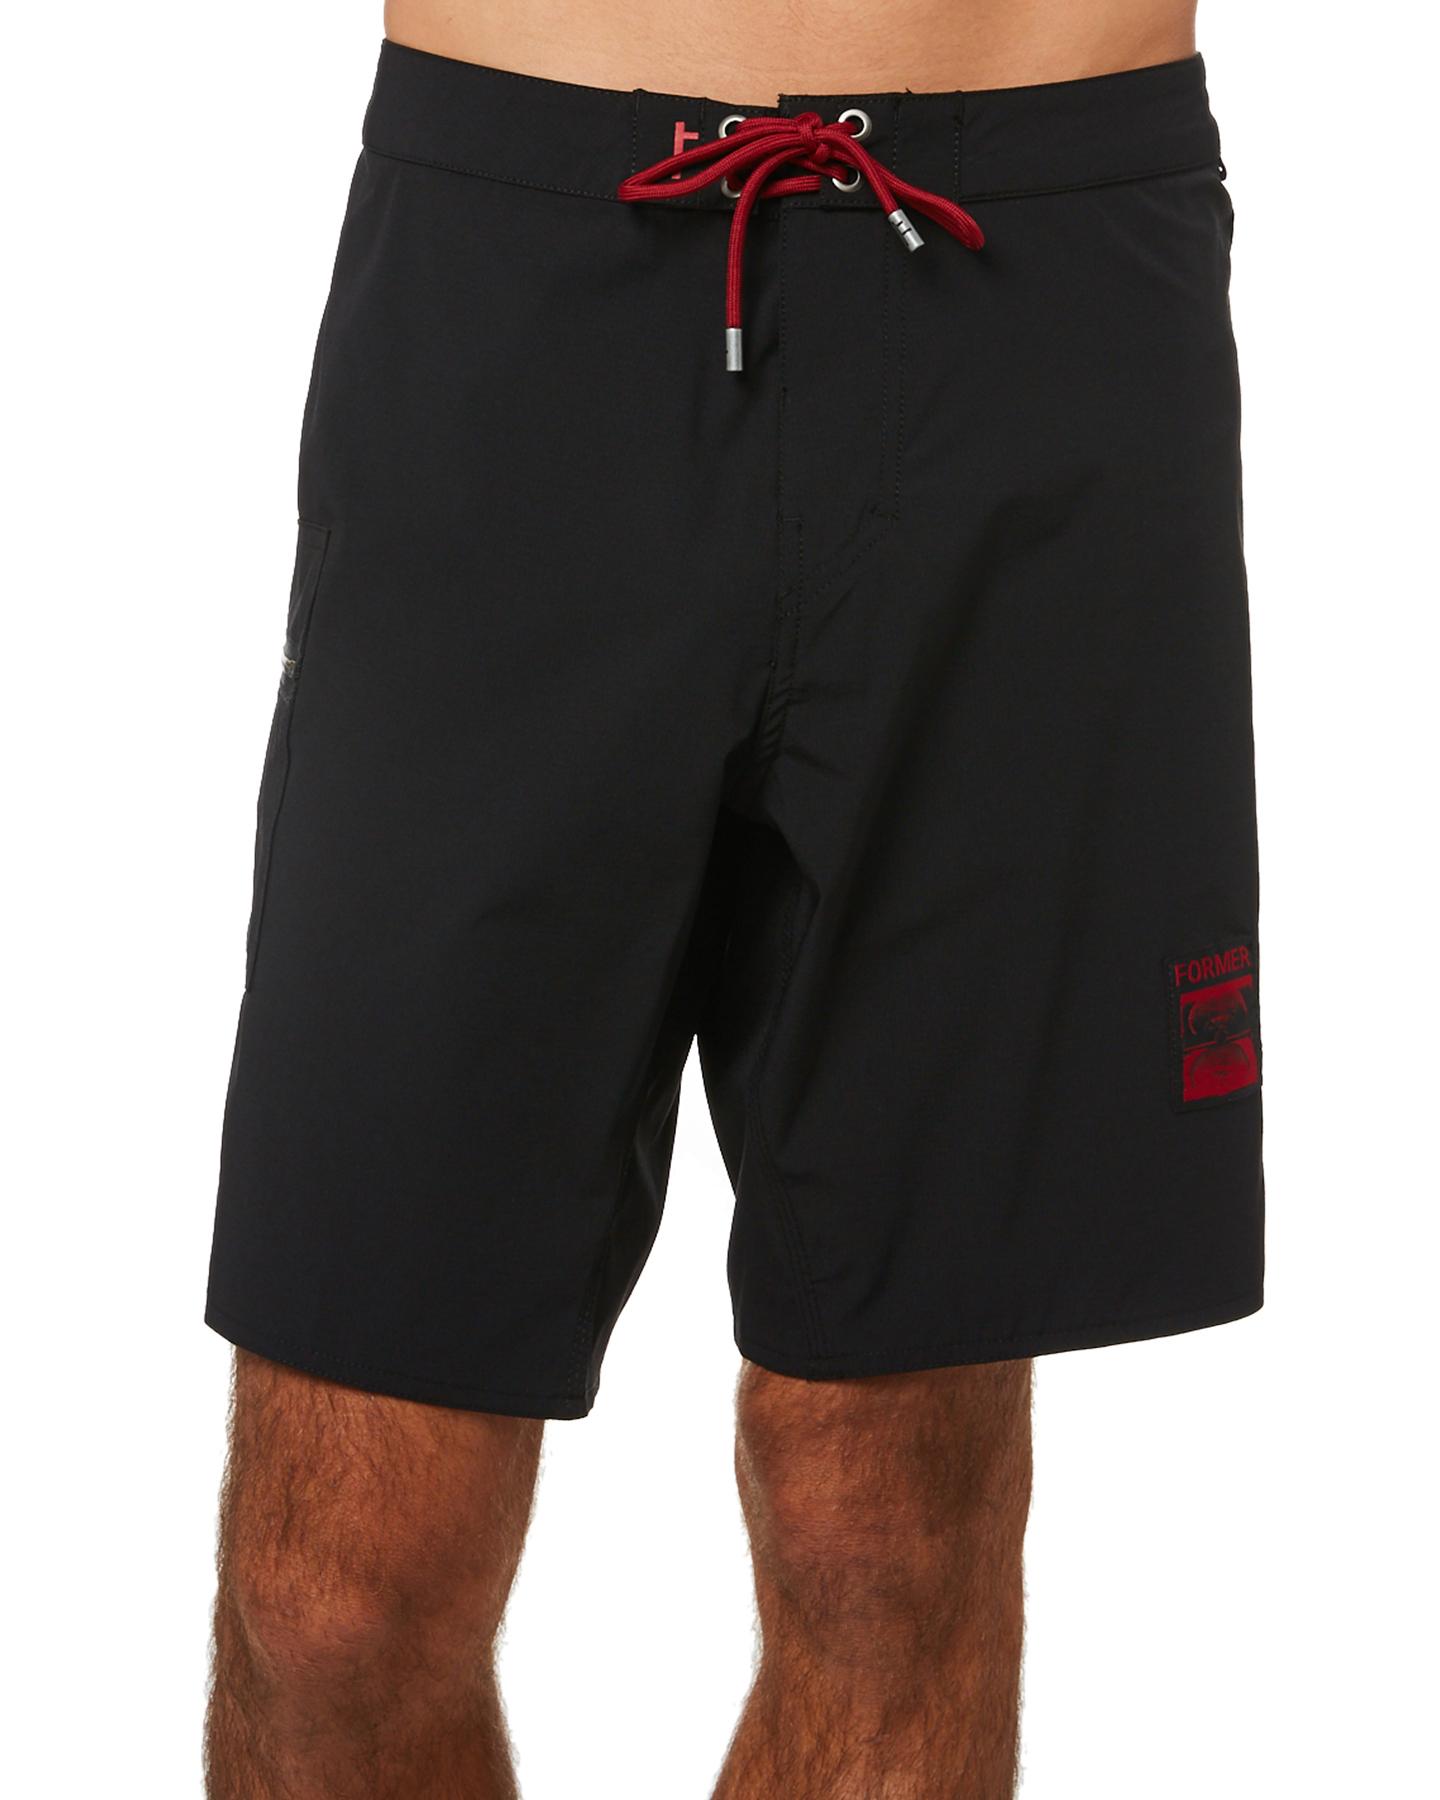 Former Dane Mens 18.5In Trunk Black Red